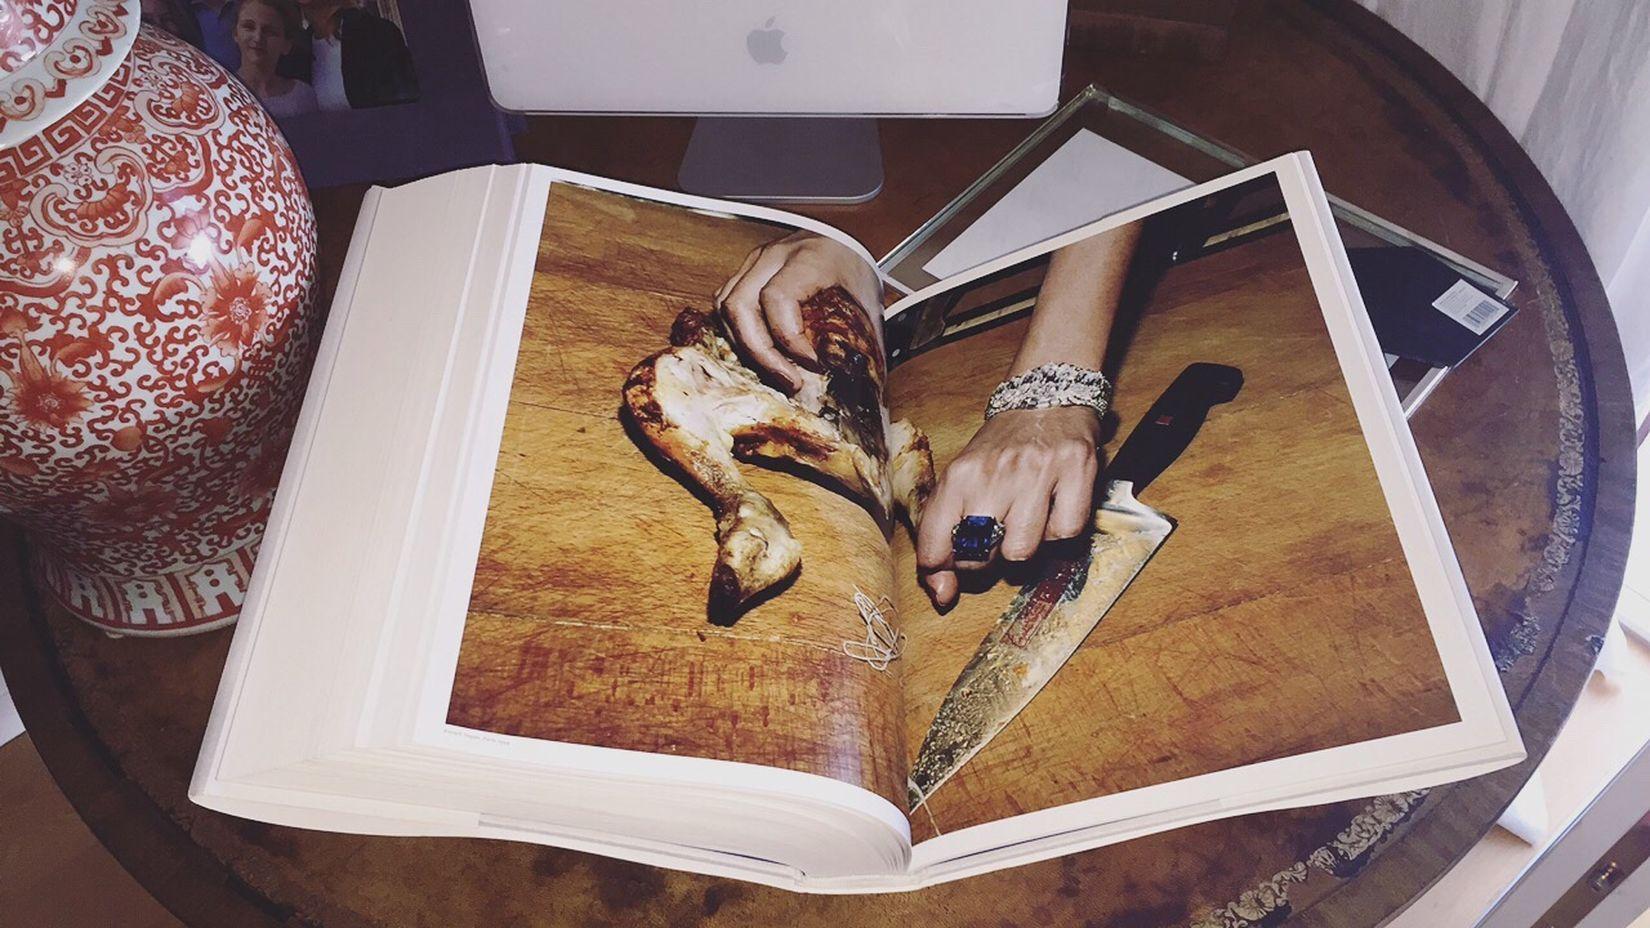 Art at home Art Photography Photographybook Books Drama